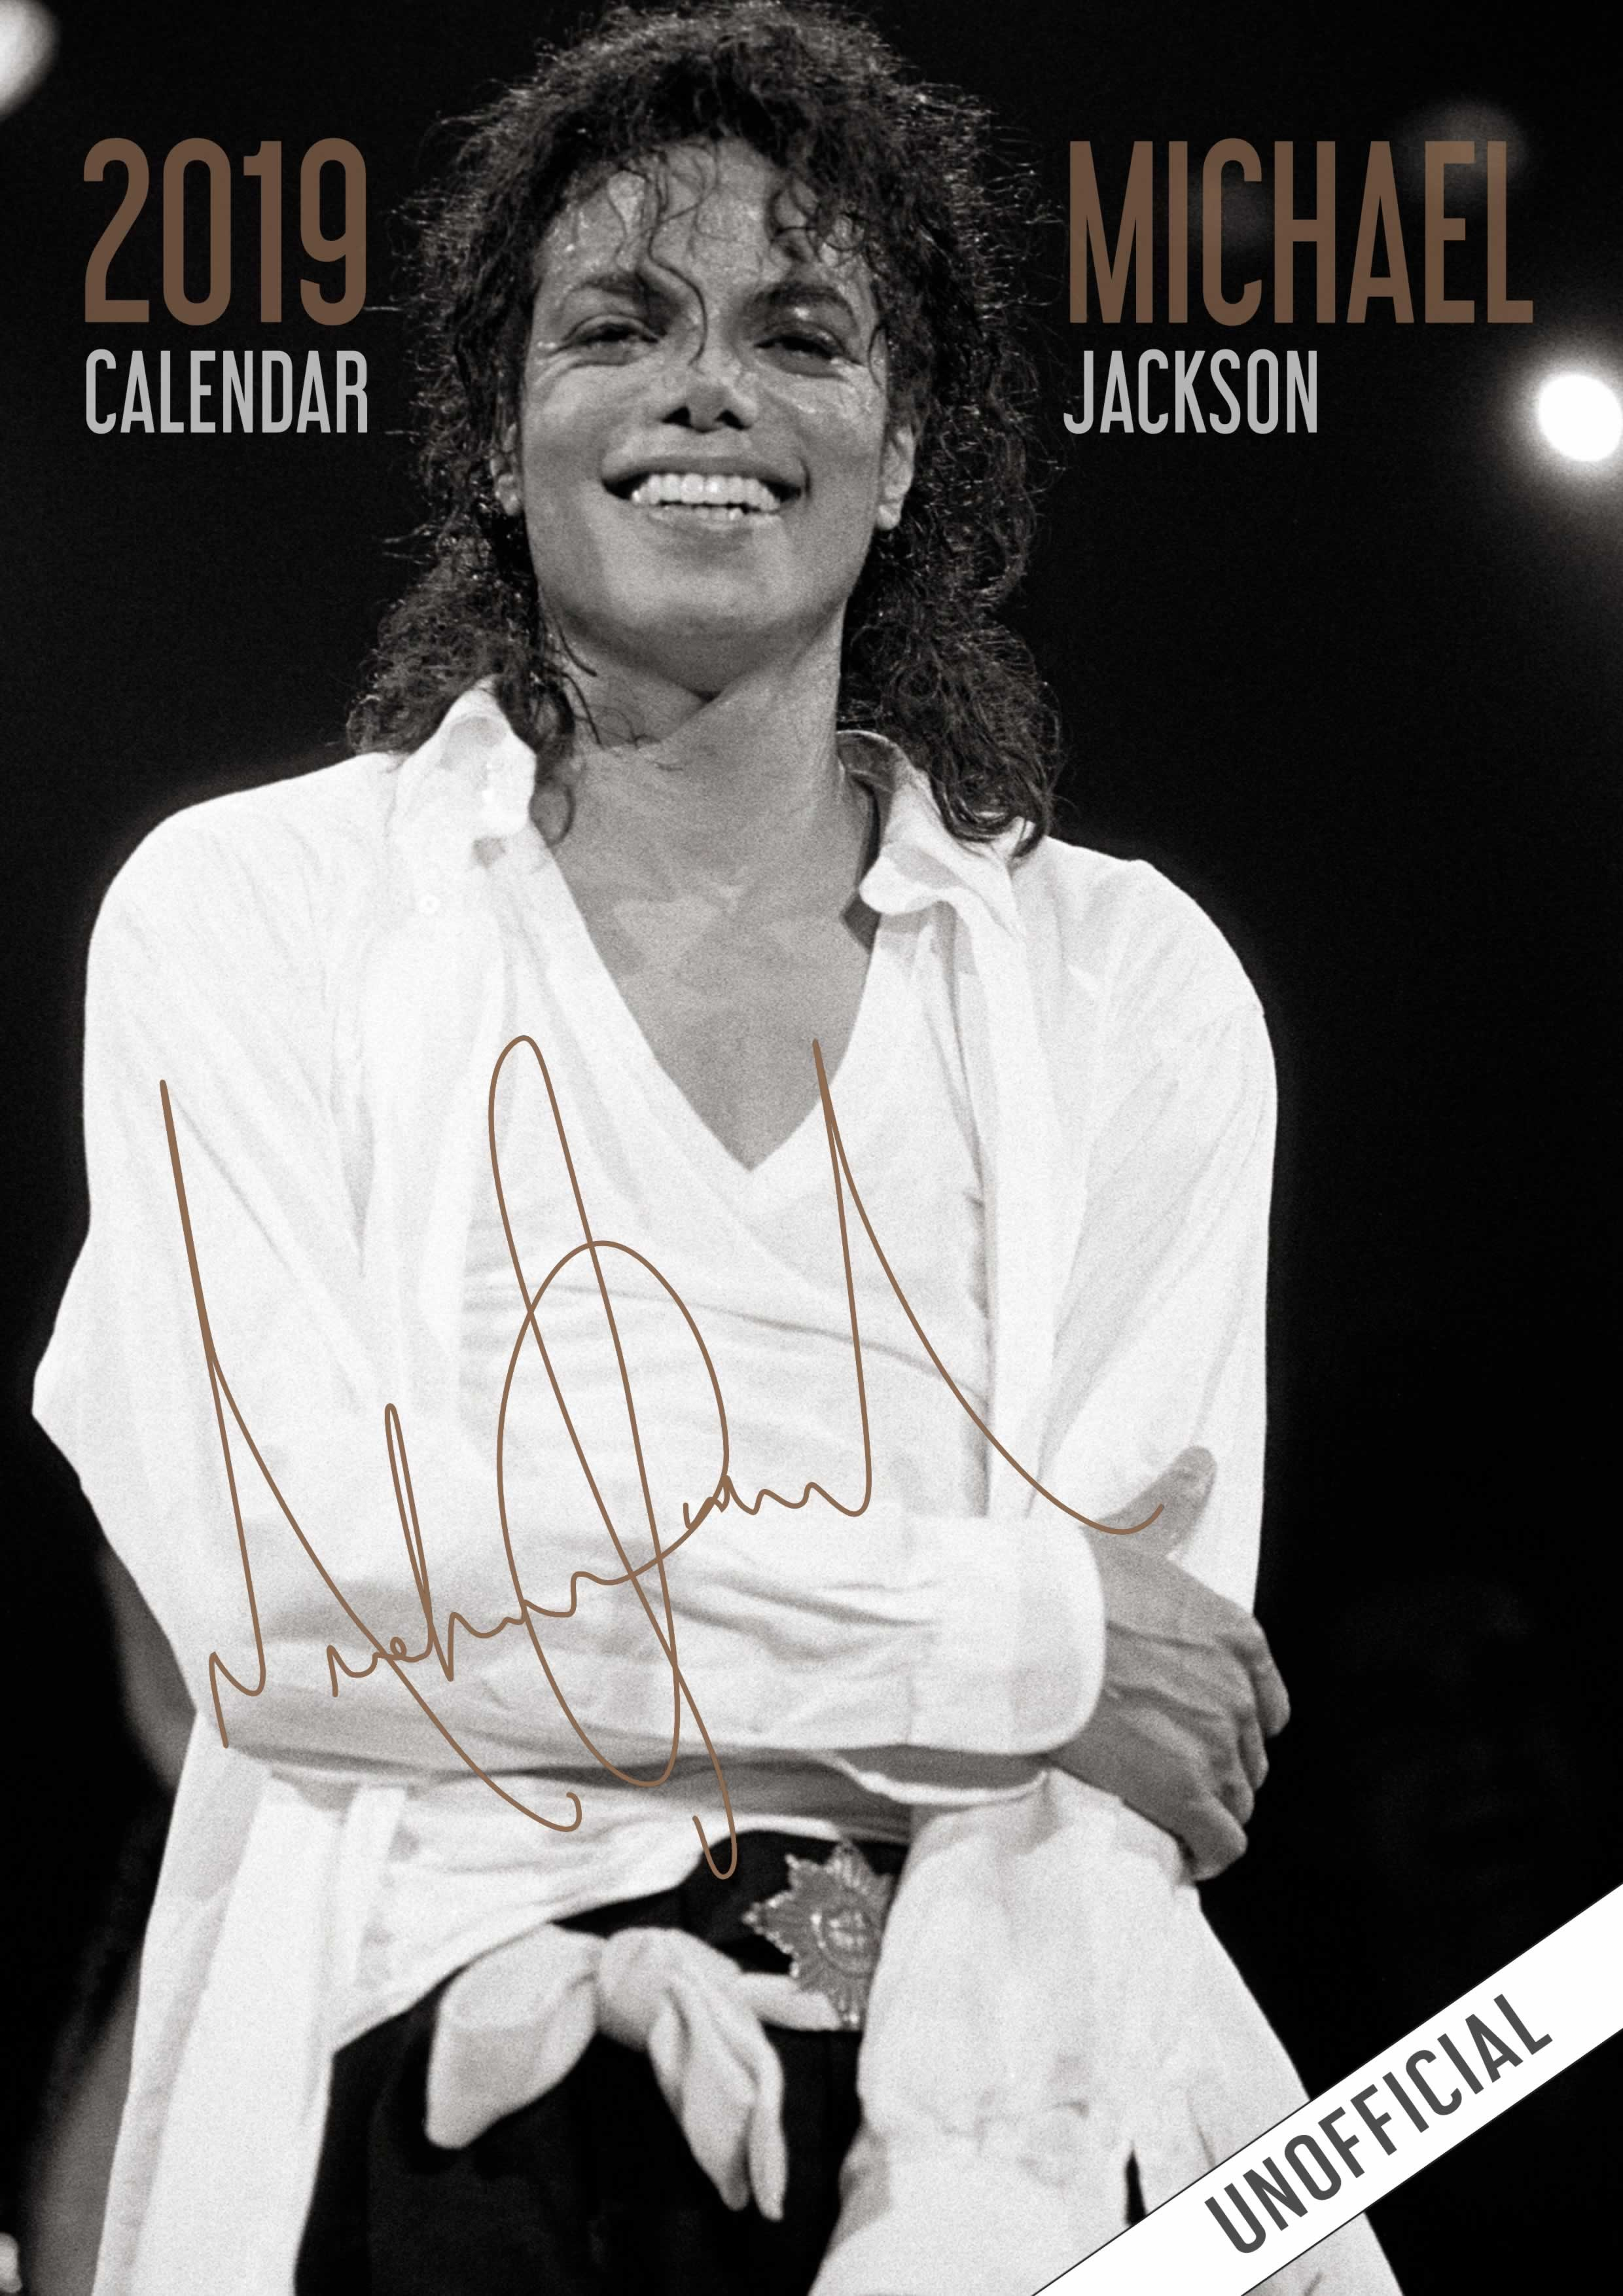 Michael Jackson Calendar 2019 Unofficial Product Code High Quality Full Colour A4 Wall Calendar